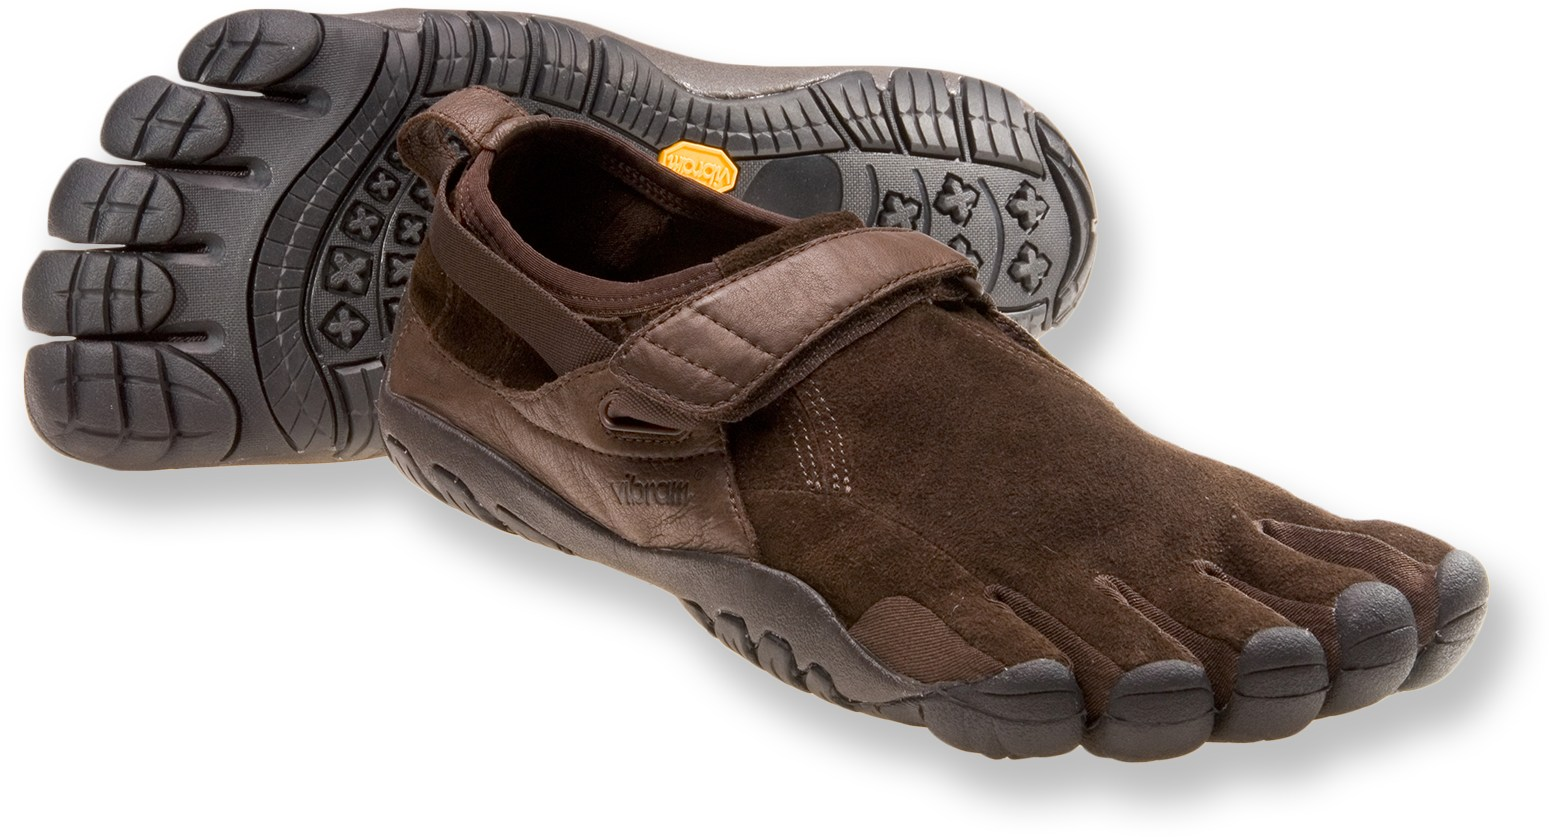 Barefoot In Arizona Shoe Review Vibram Fivefingers Kso Trek